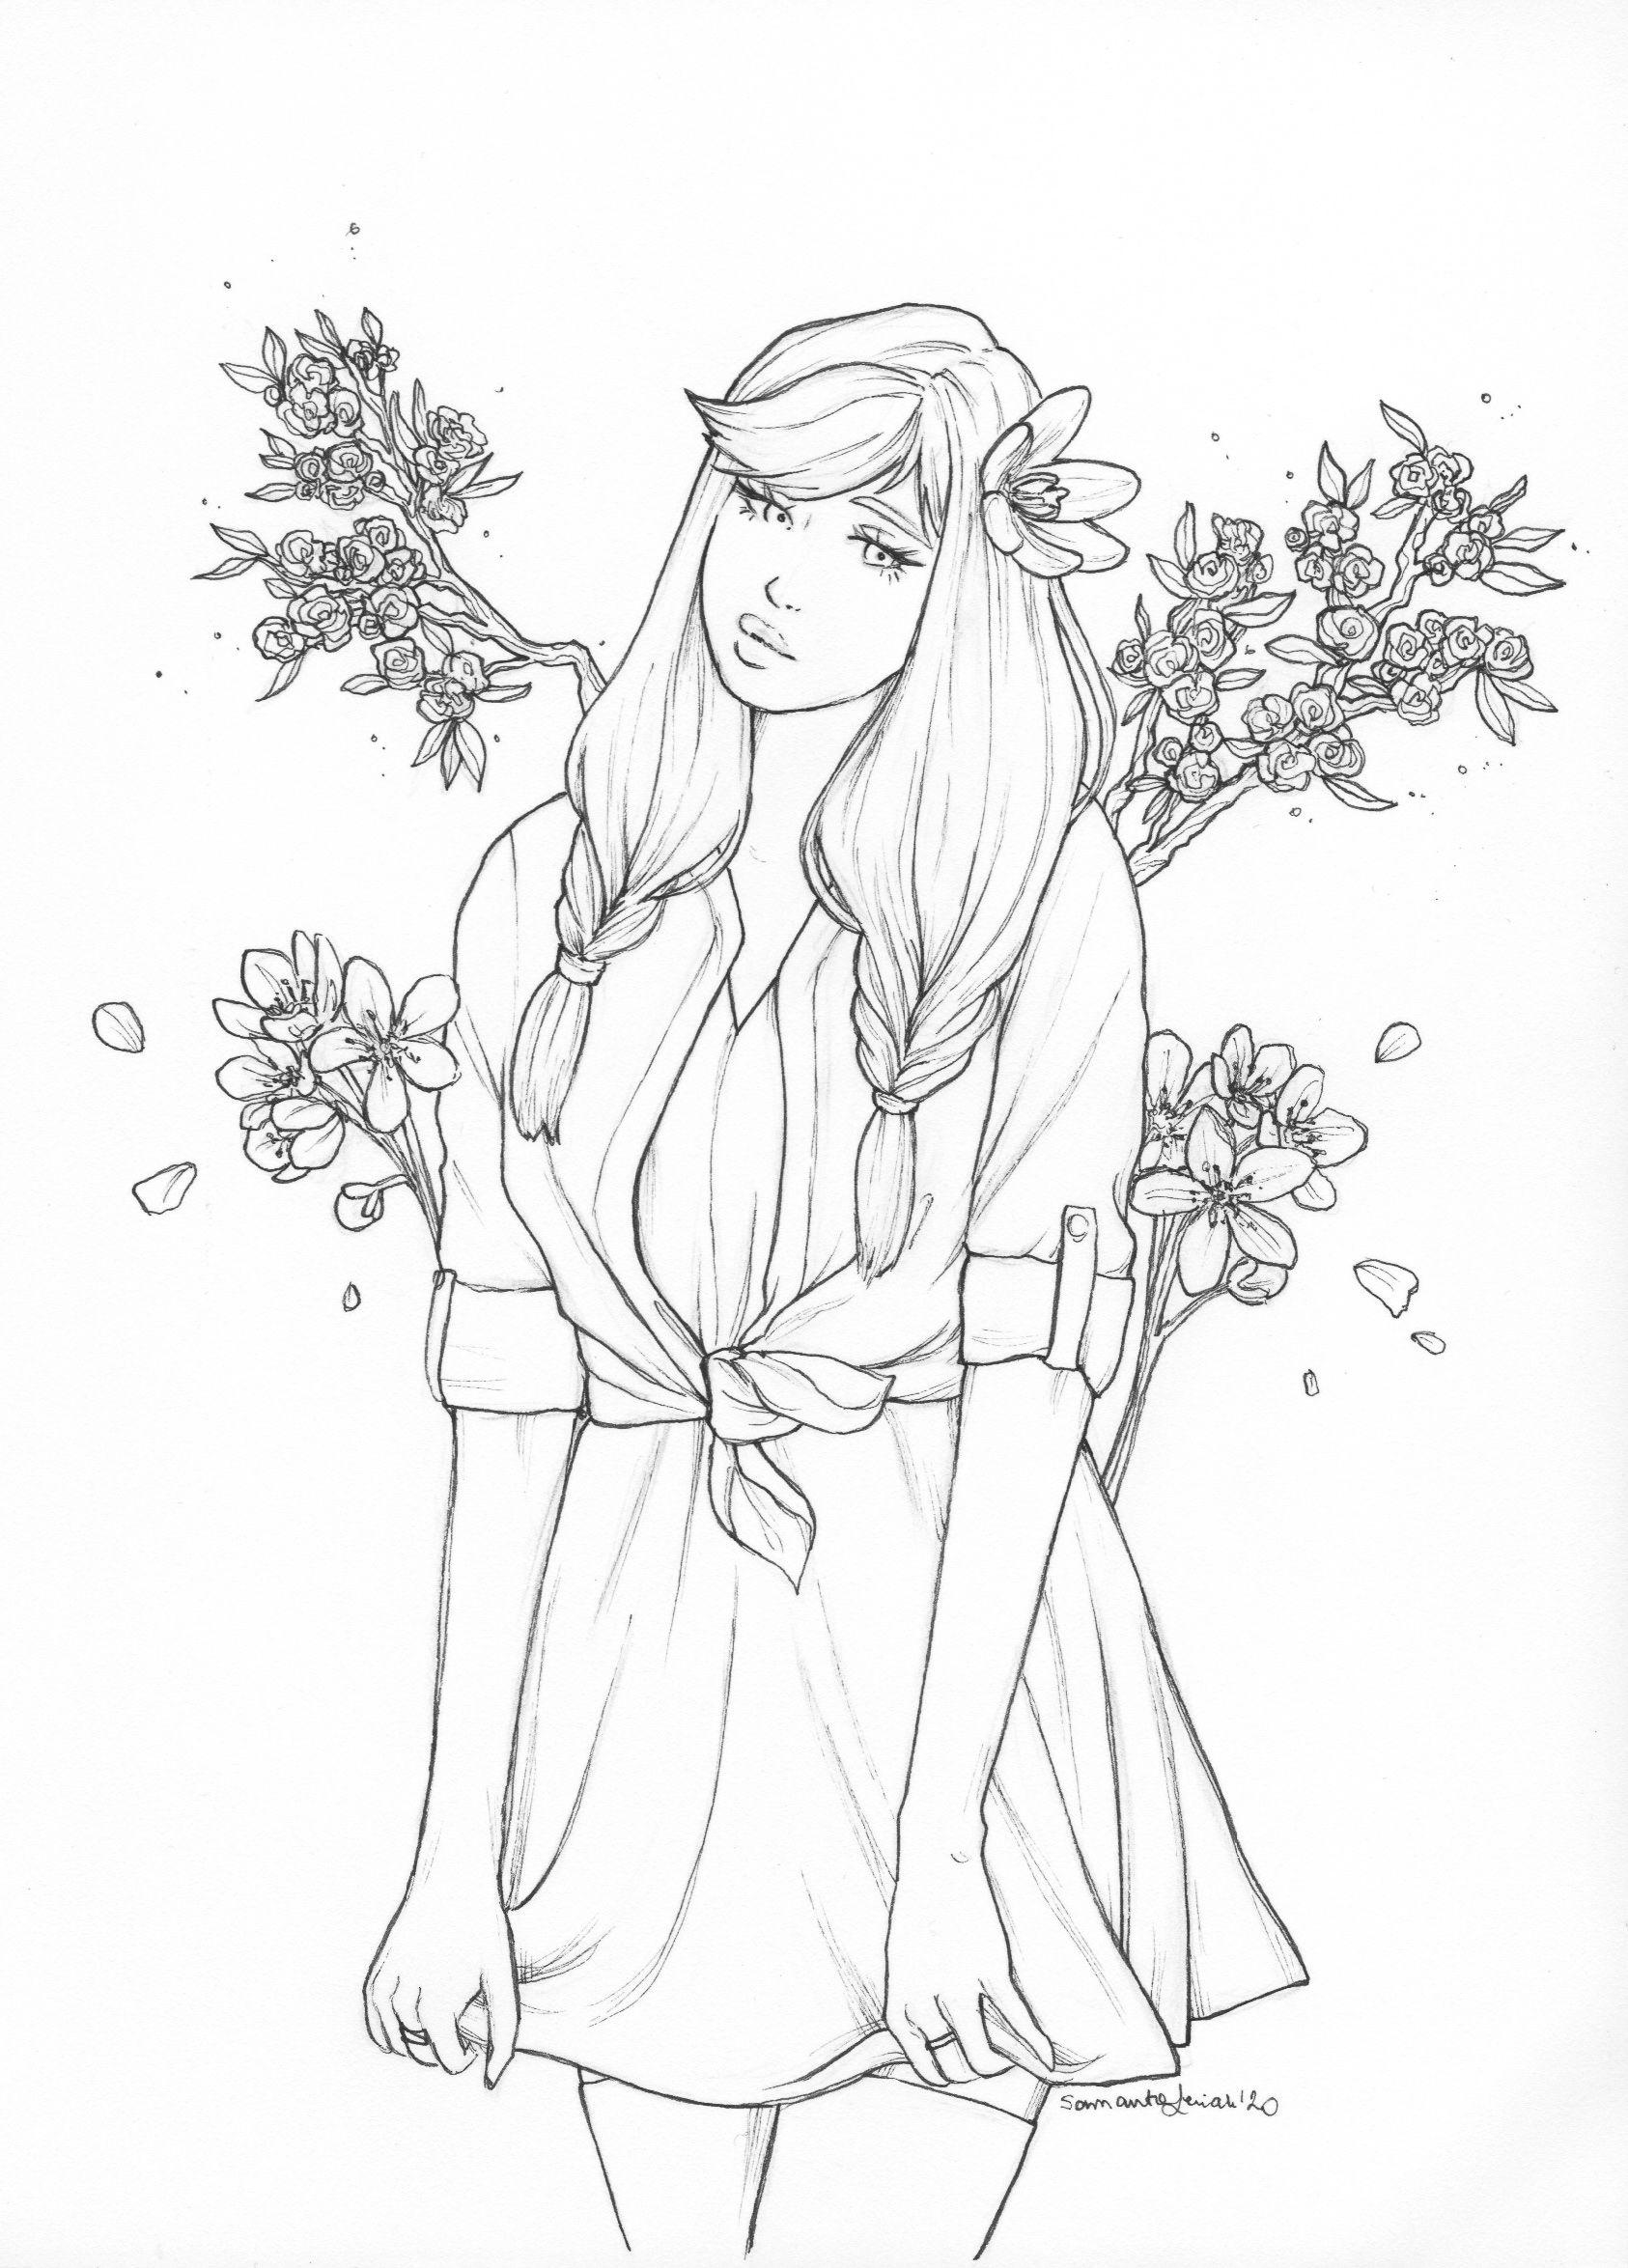 Kolorowanka In 2020 Art Drawings Simple Coloring Pages For Girls Drawing People